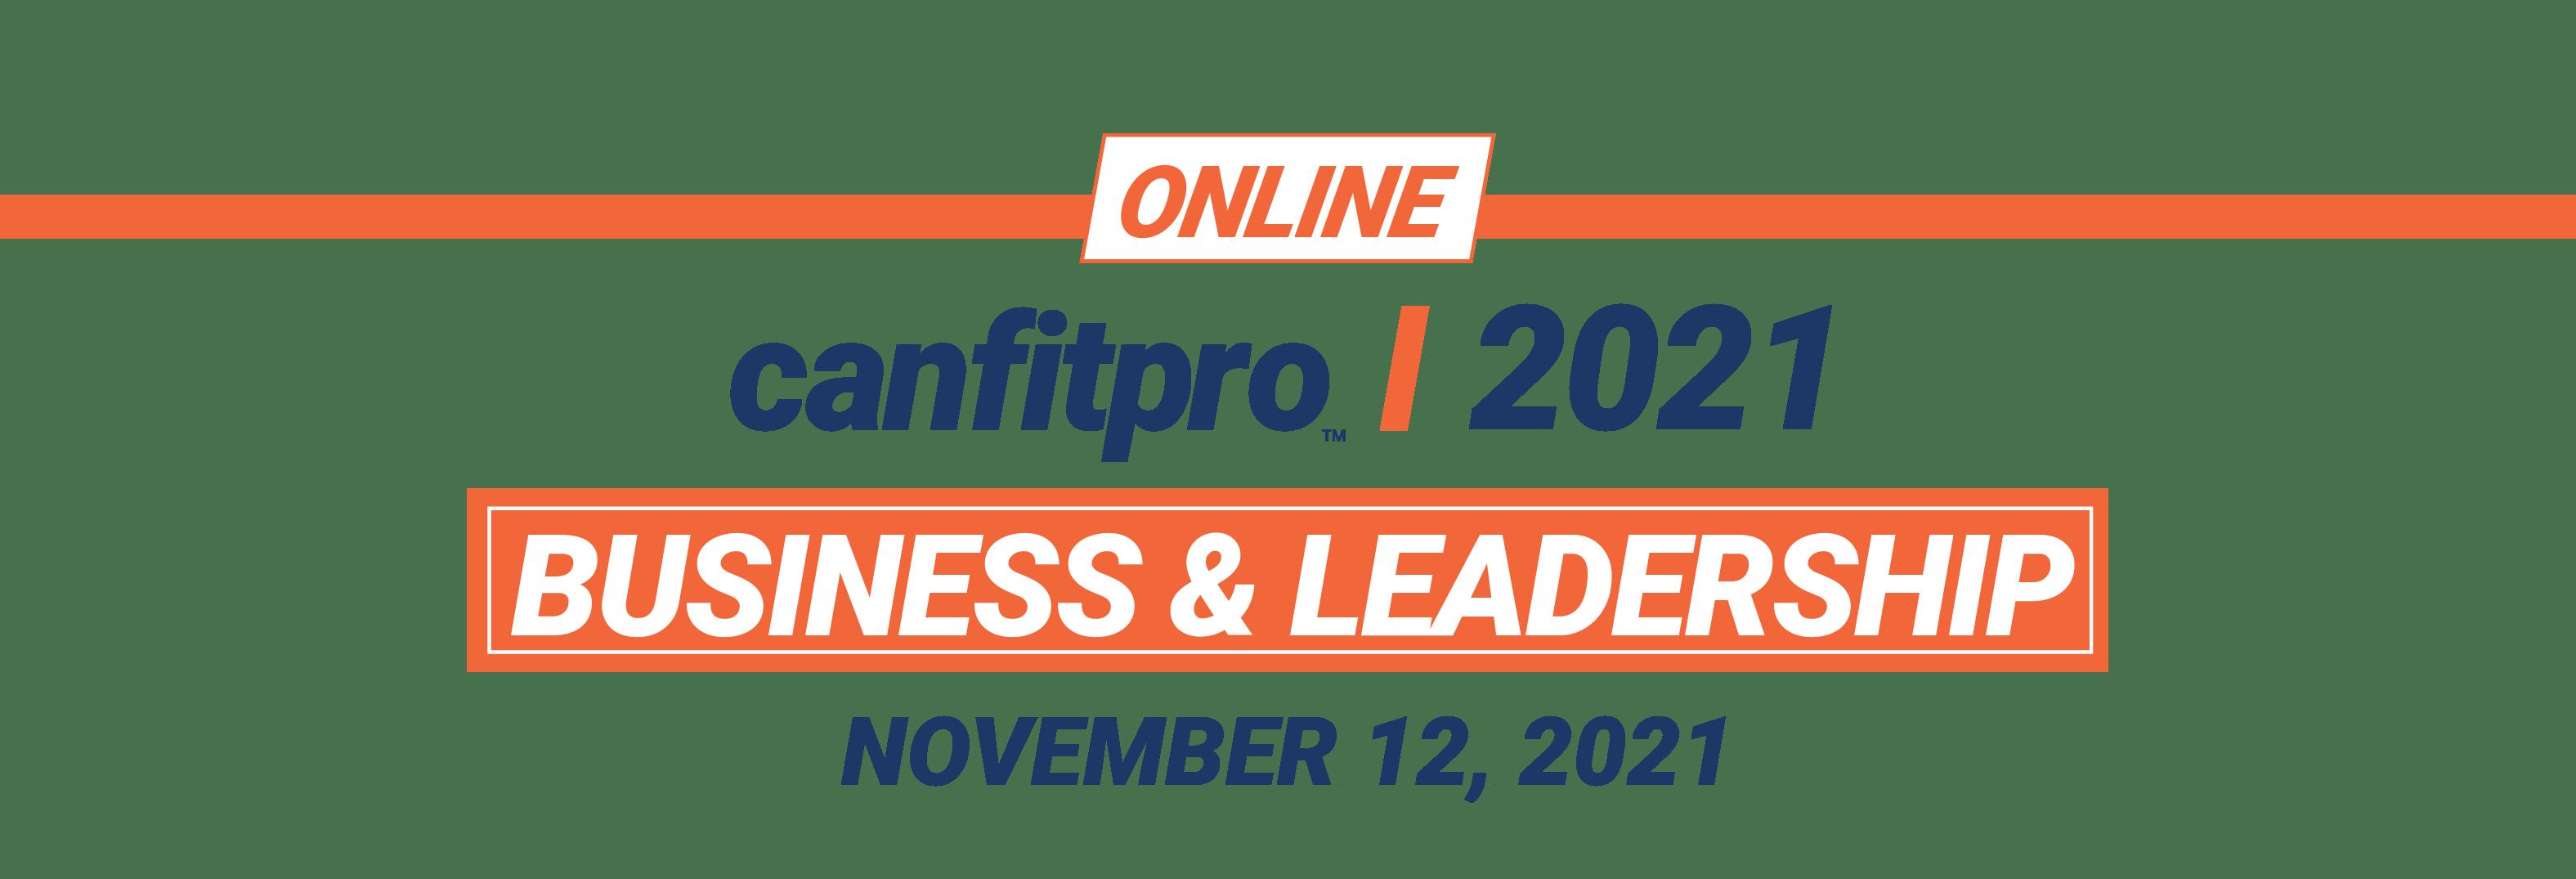 canfitpro 2021 Online: Business & Leadership logo